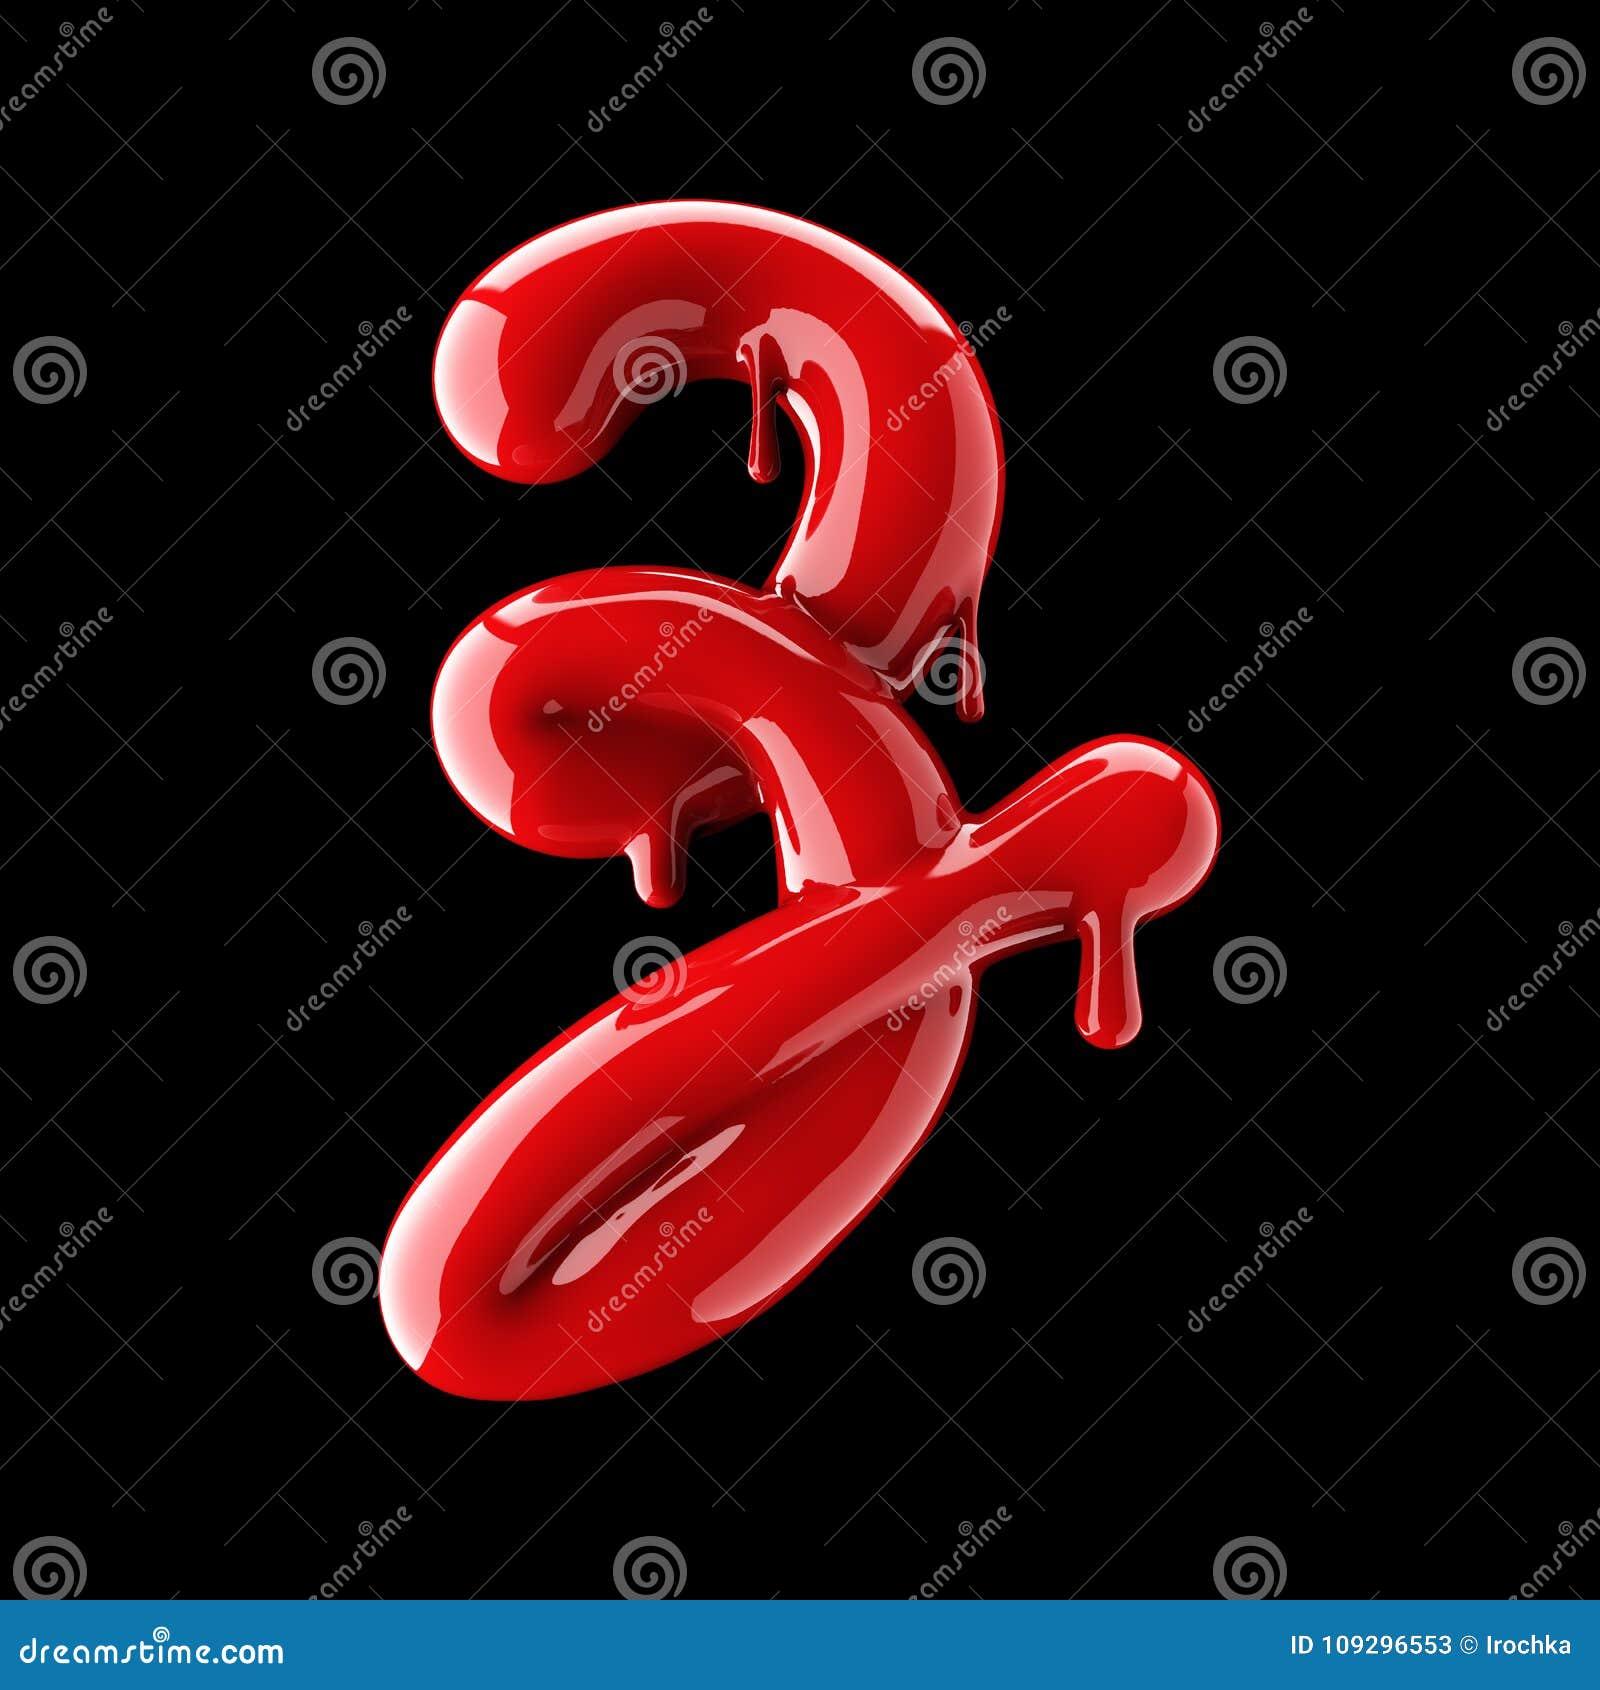 Leaky red alphabet on black background. Handwritten cursive letter Z.